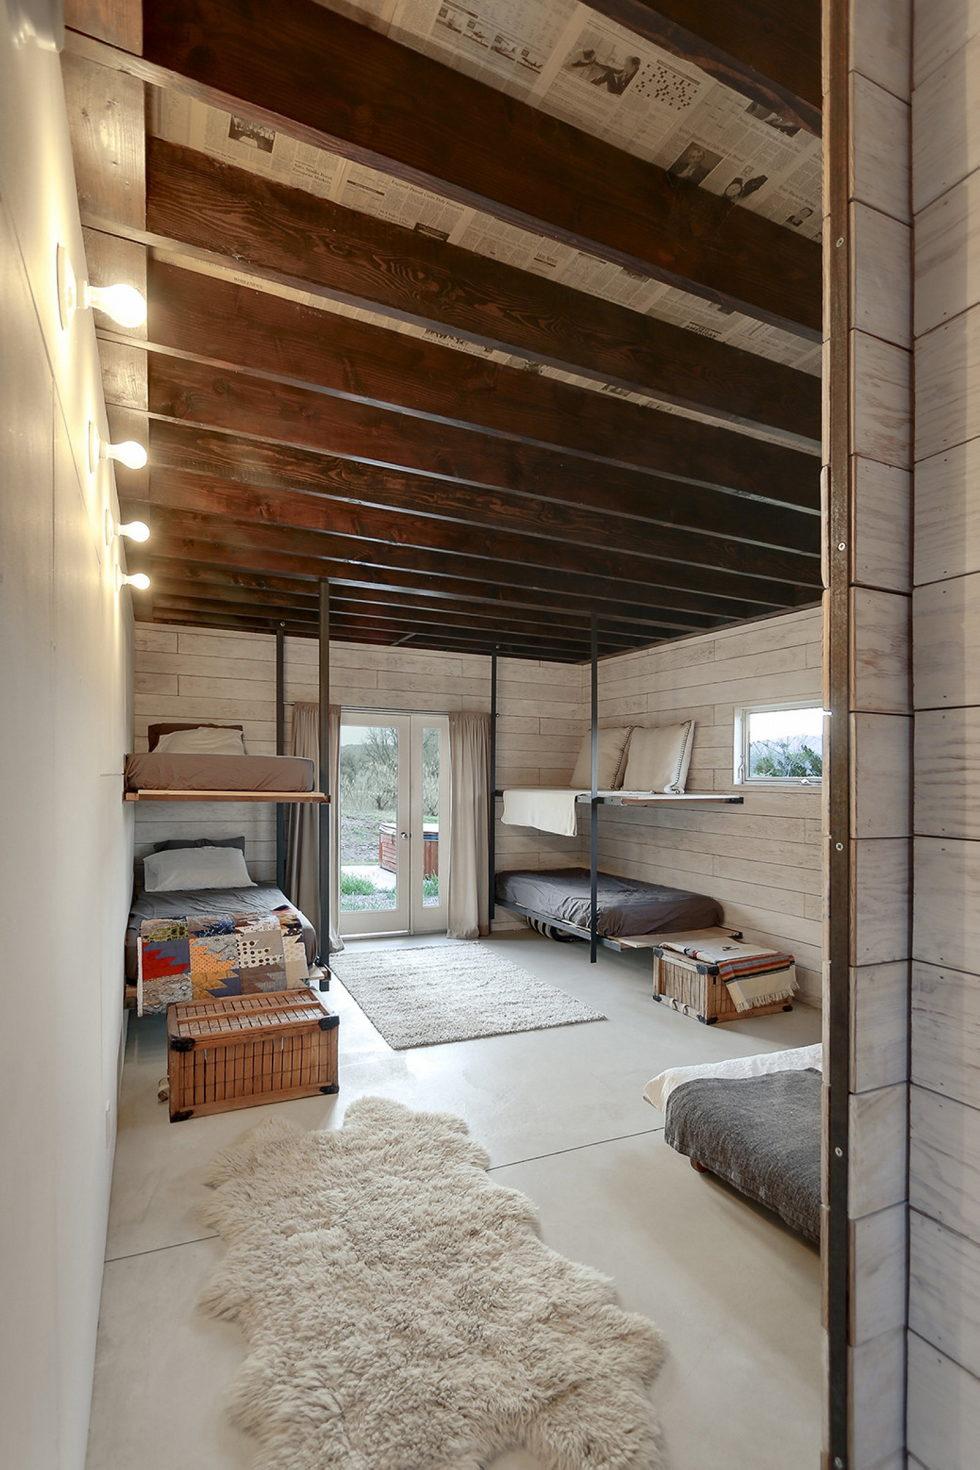 510 Cabin The Country House From Hunter Leggitt Studio In The USA 7